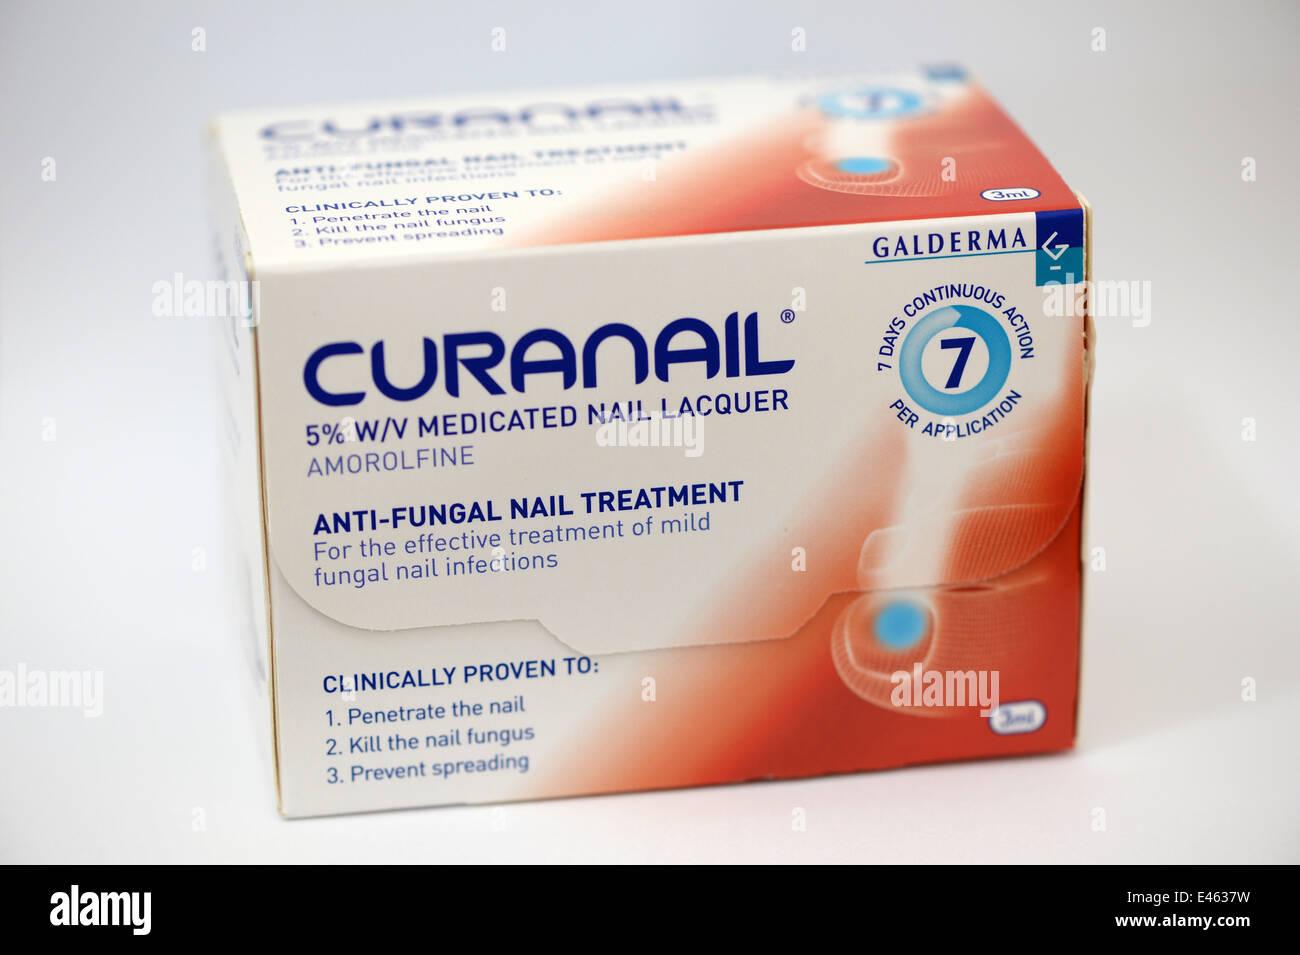 Curanail, fungal nail treatment Stock Photo: 71434381 - Alamy